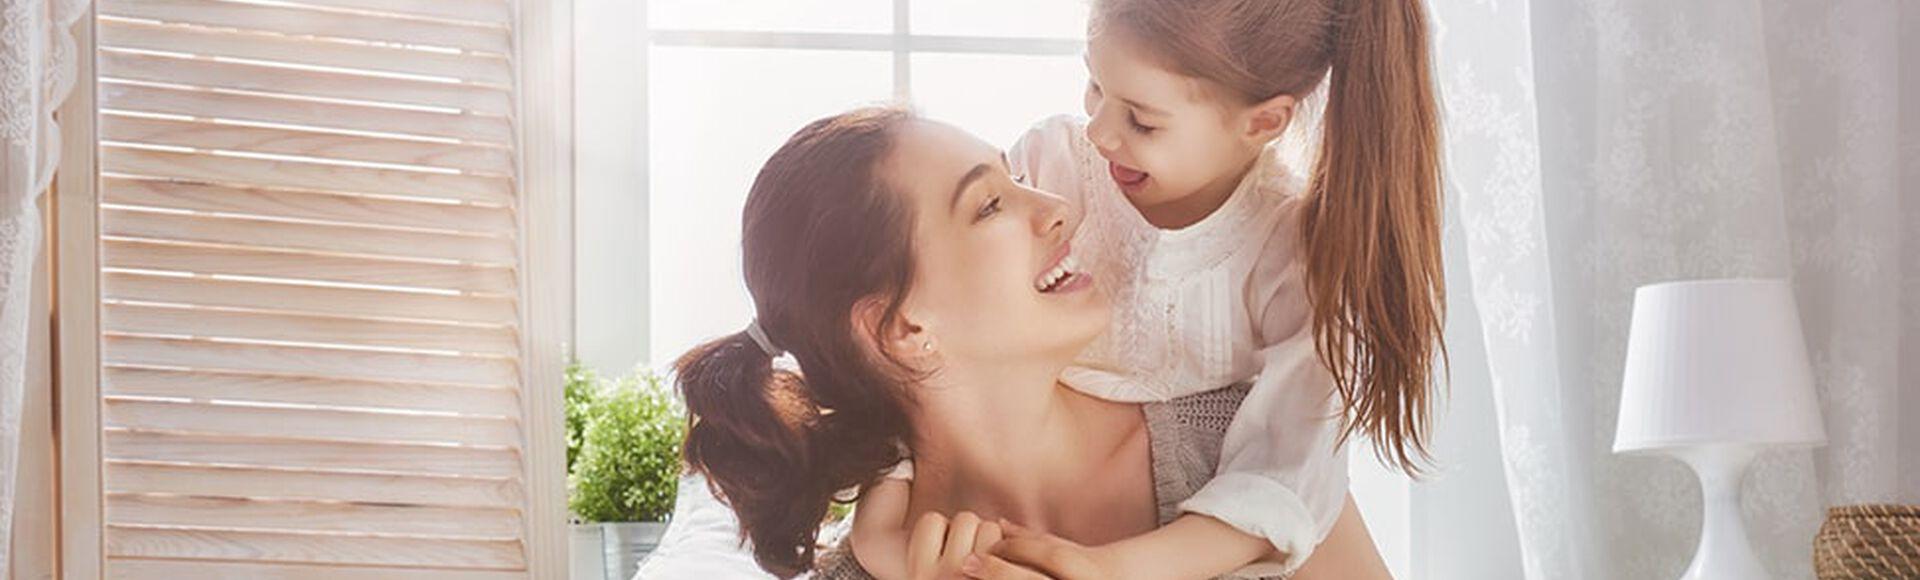 Alegria y amor entre madre e hija